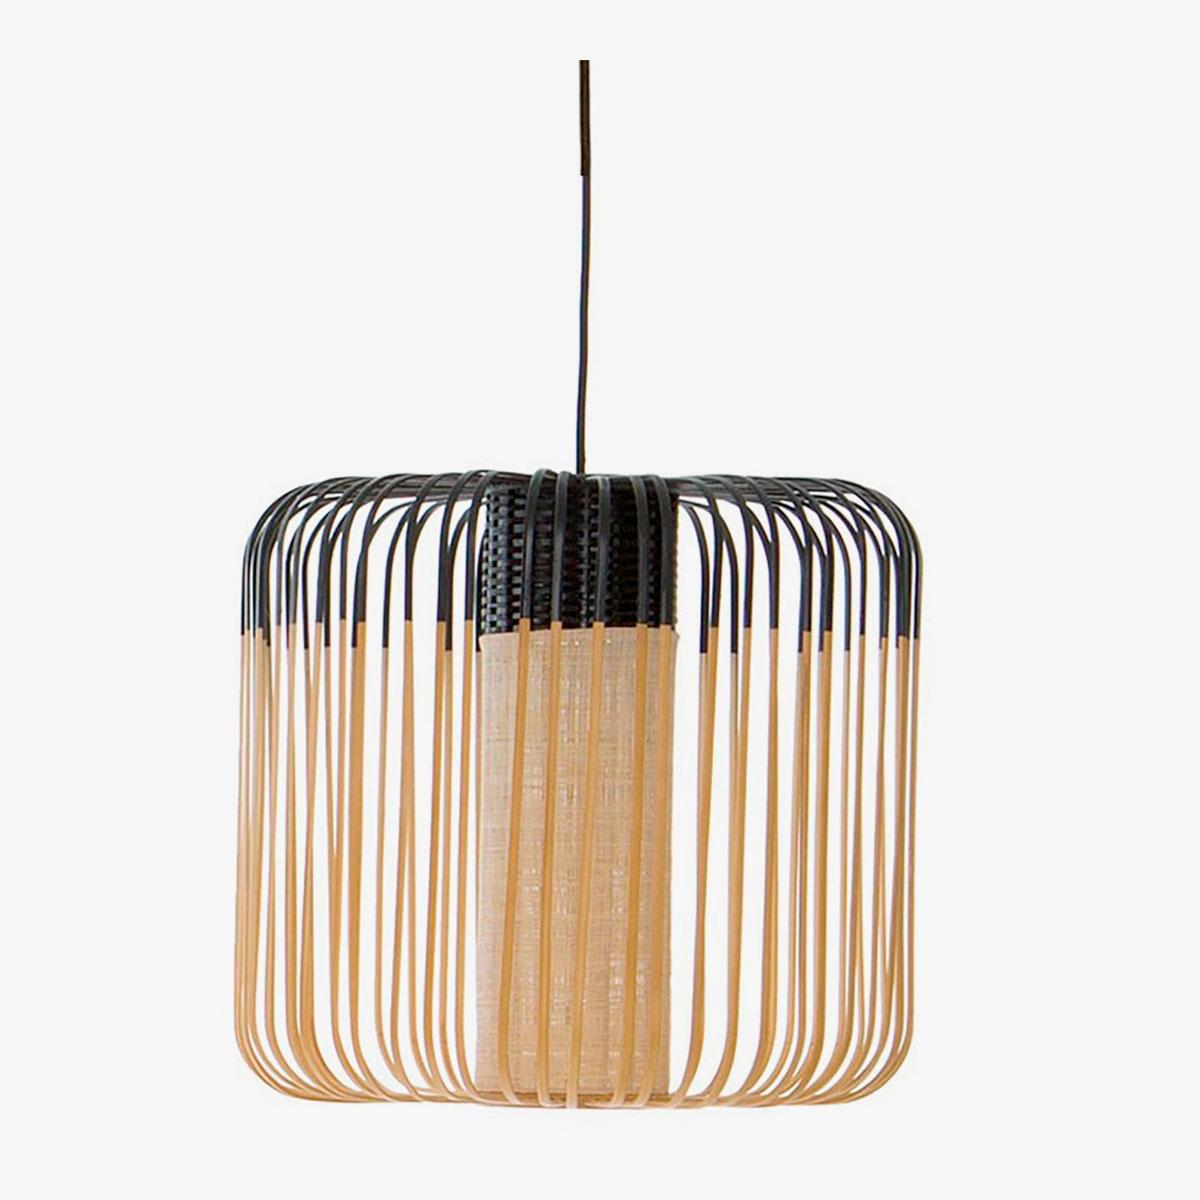 Lámpara colgante exterior Bamboo Light M natural y negro Forestier-0